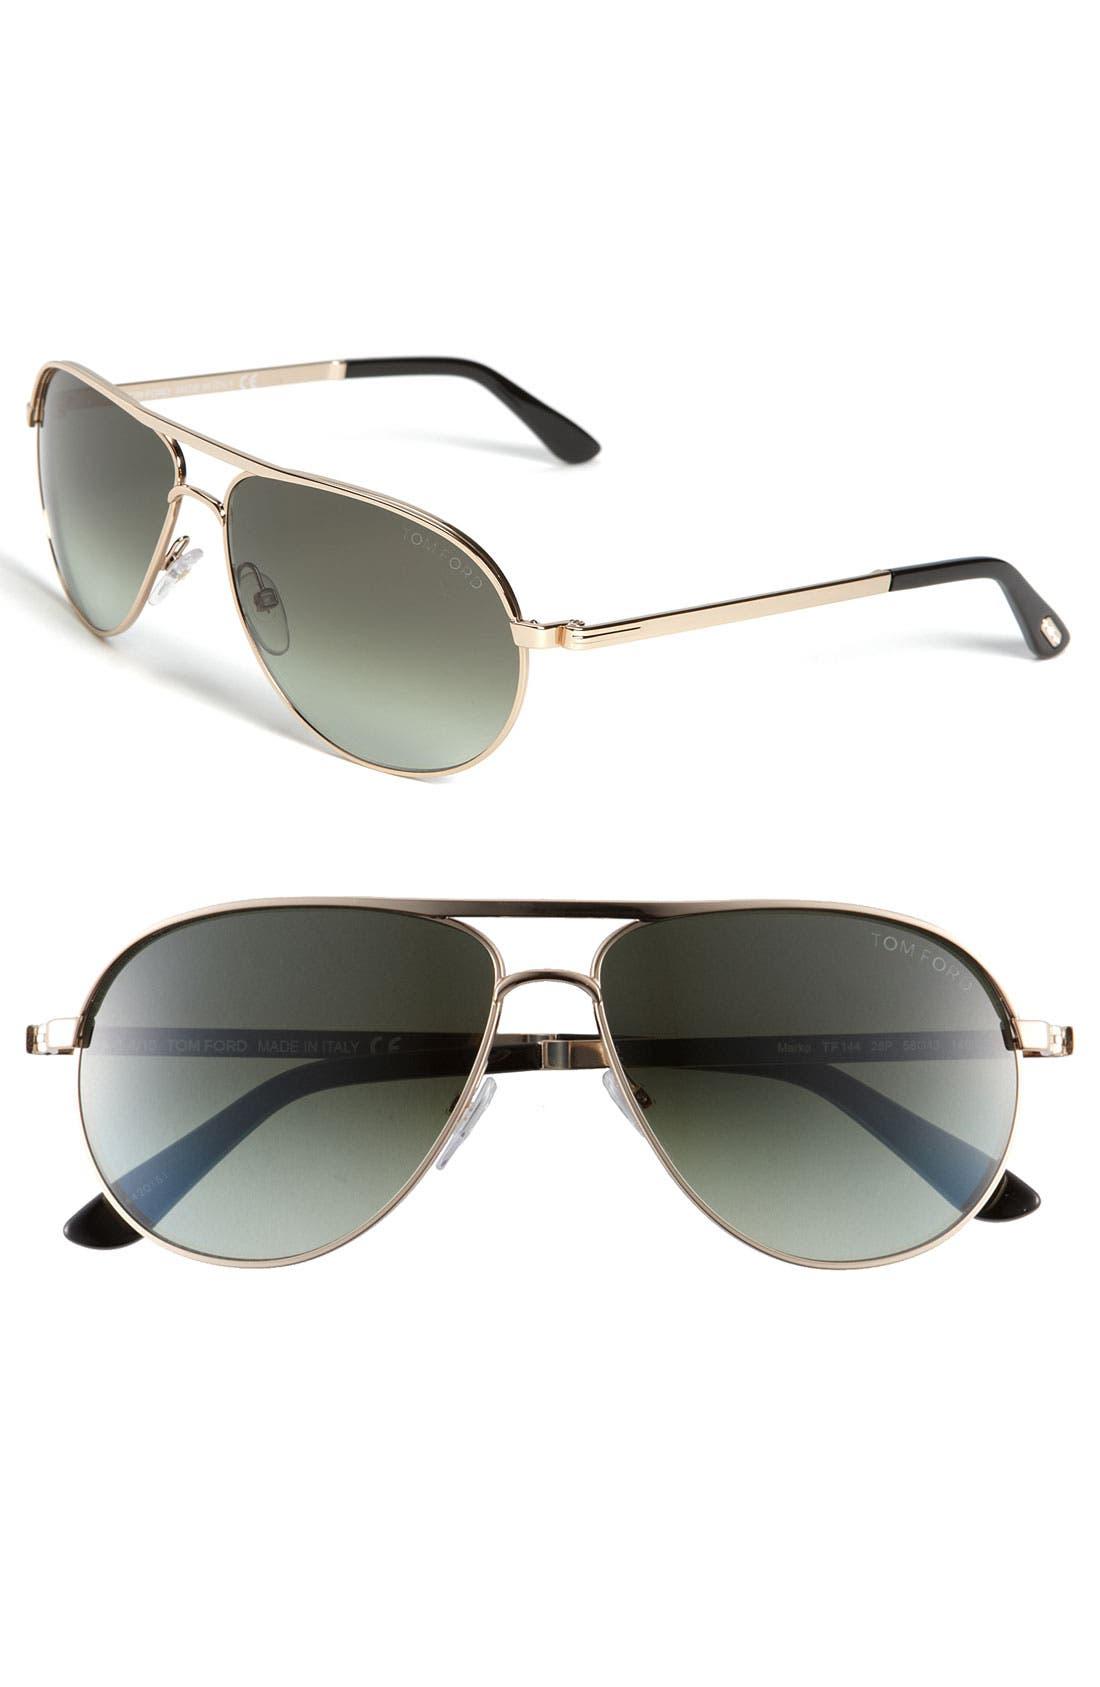 Alternate Image 1 Selected - Tom Ford 'Marko' 58mm Metal Aviator Sunglasses